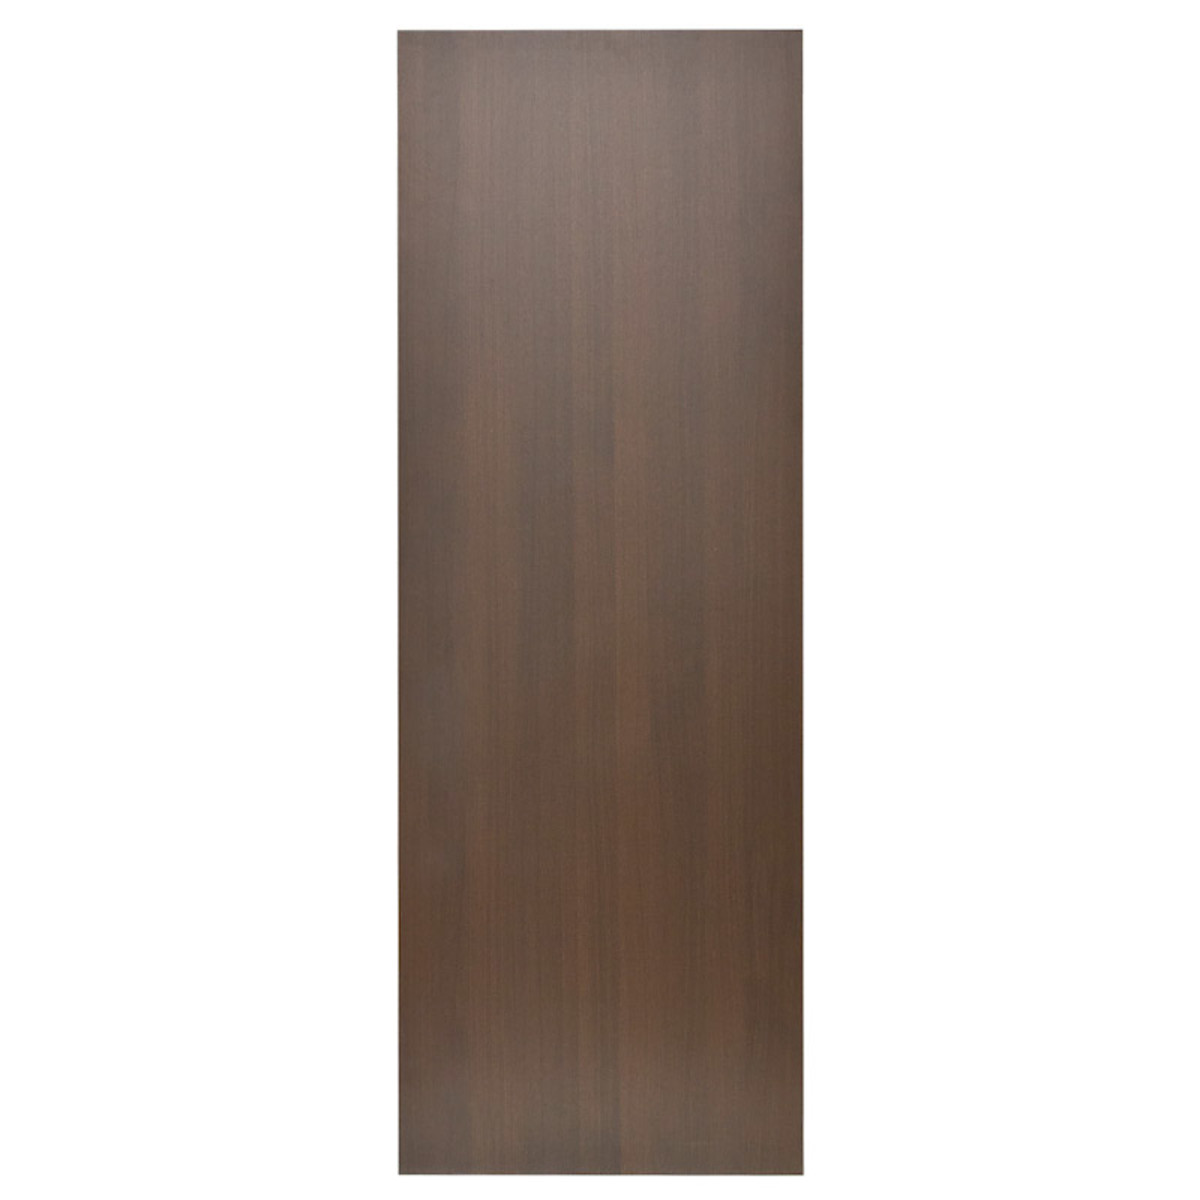 Дверь Межкомнатная Глухая 70x200 Ламинация Цвет Венге